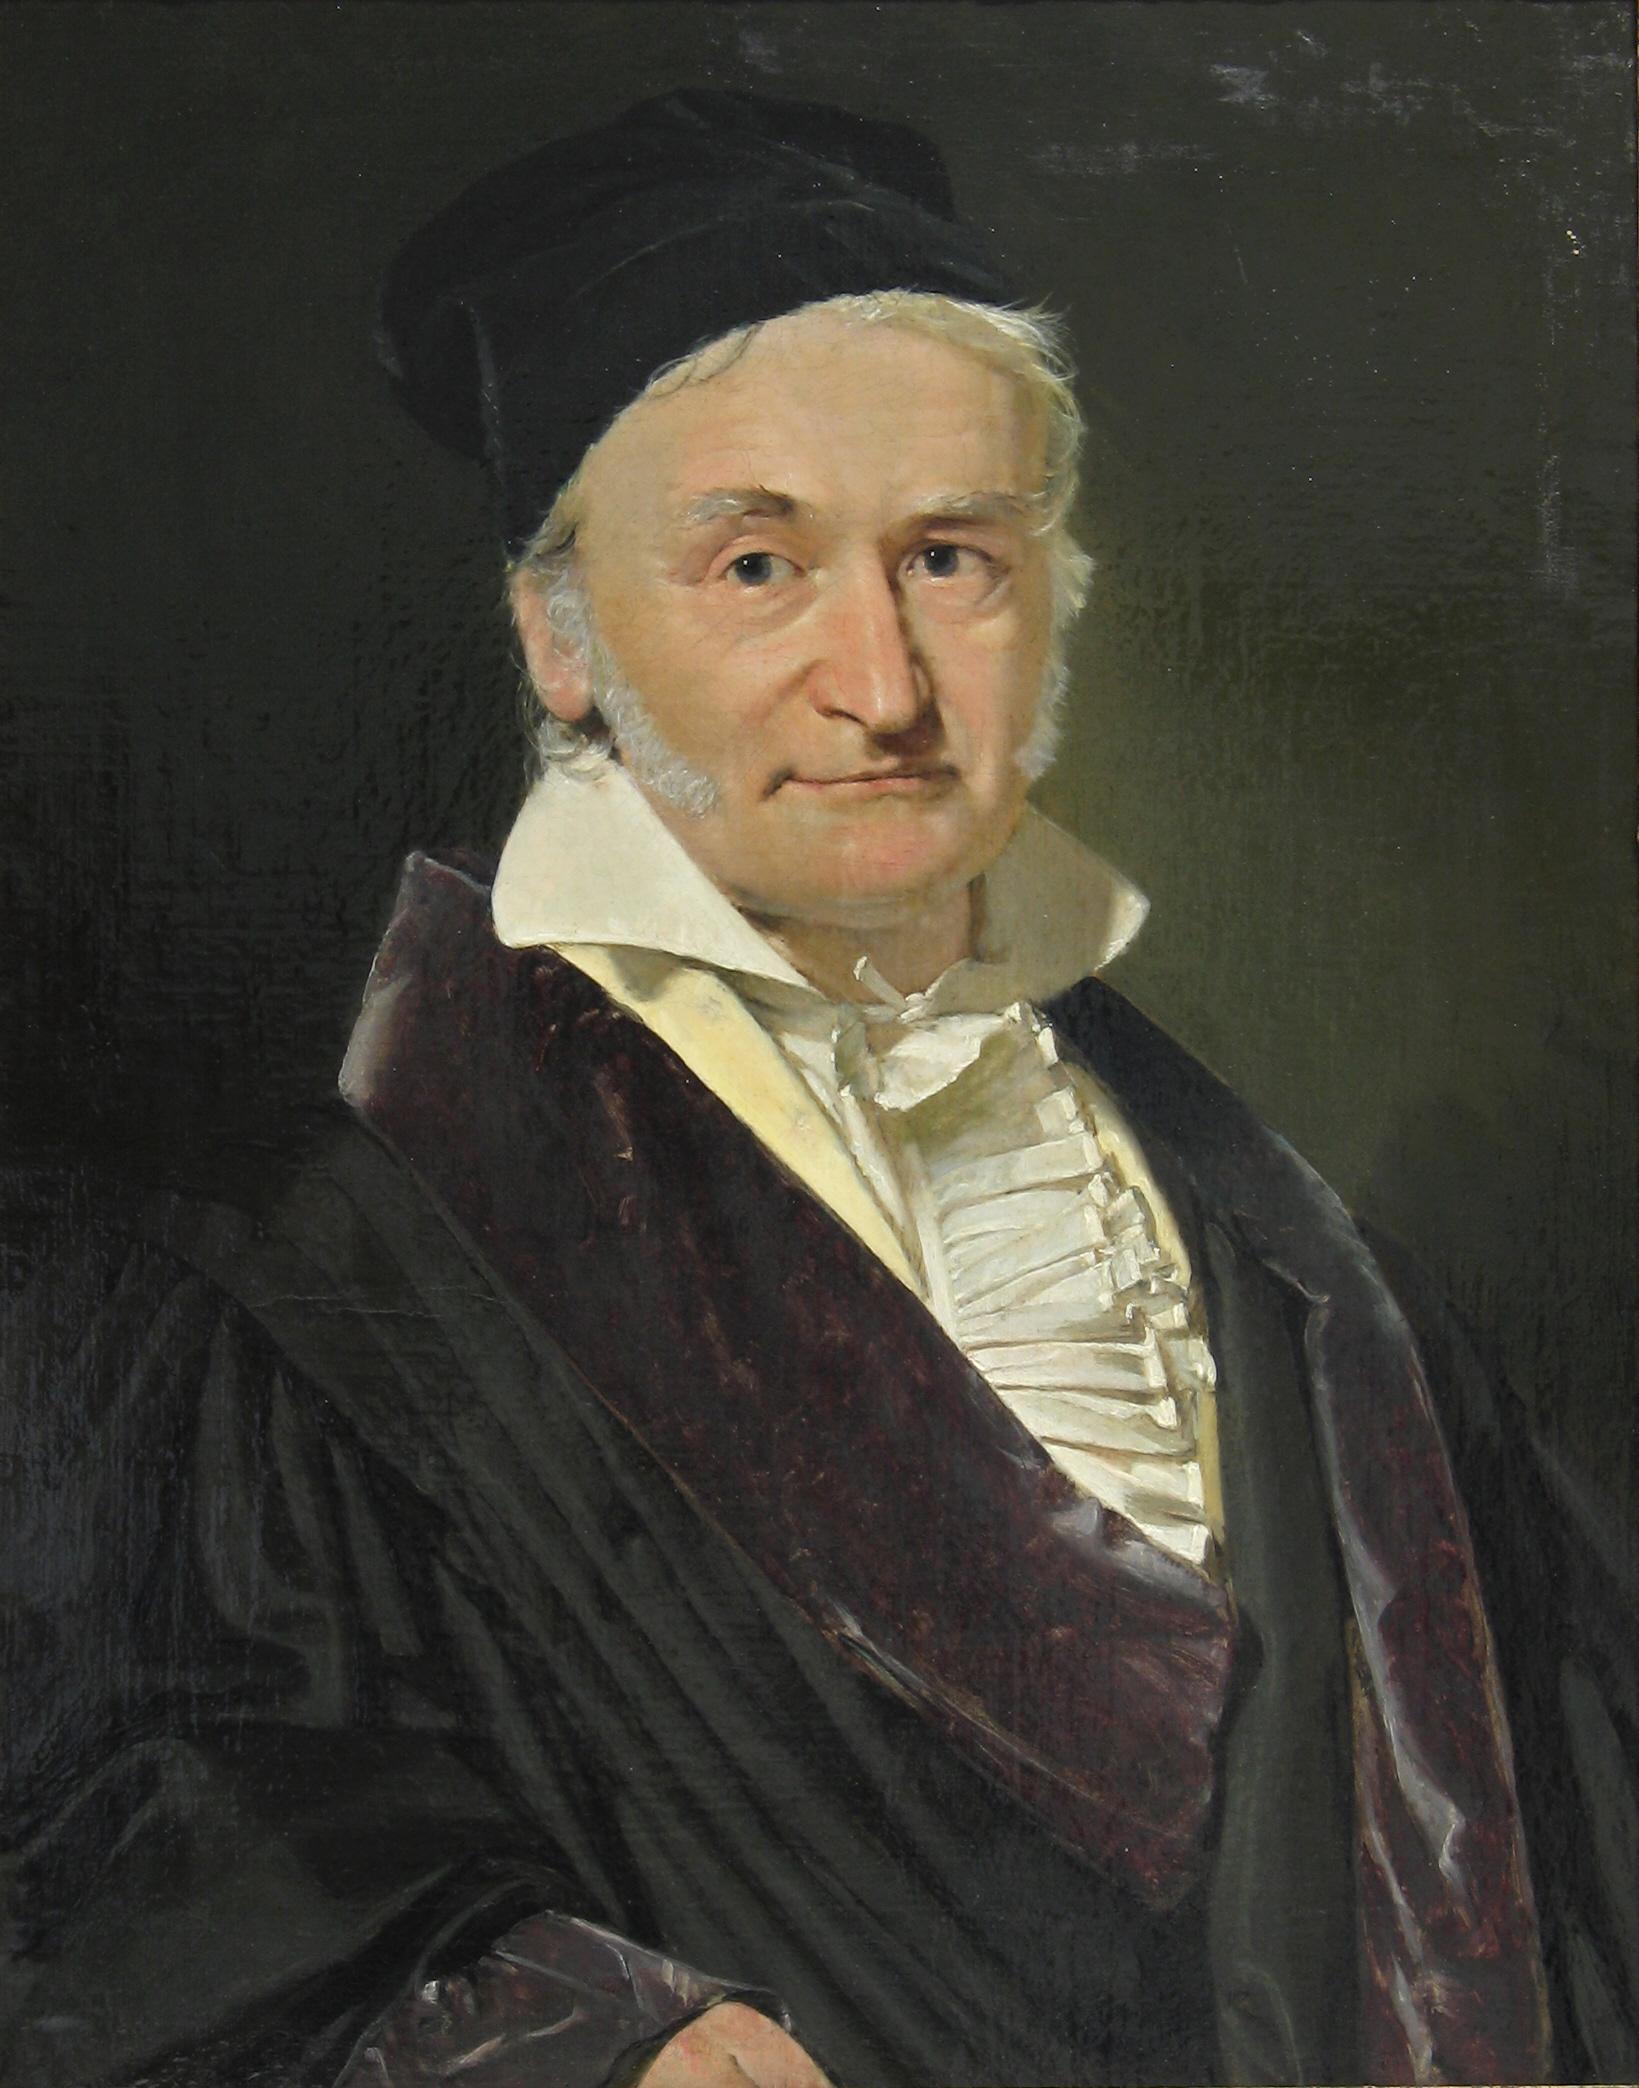 Carl Friedrich Gauss Wikipedia, la enciclopedia libre